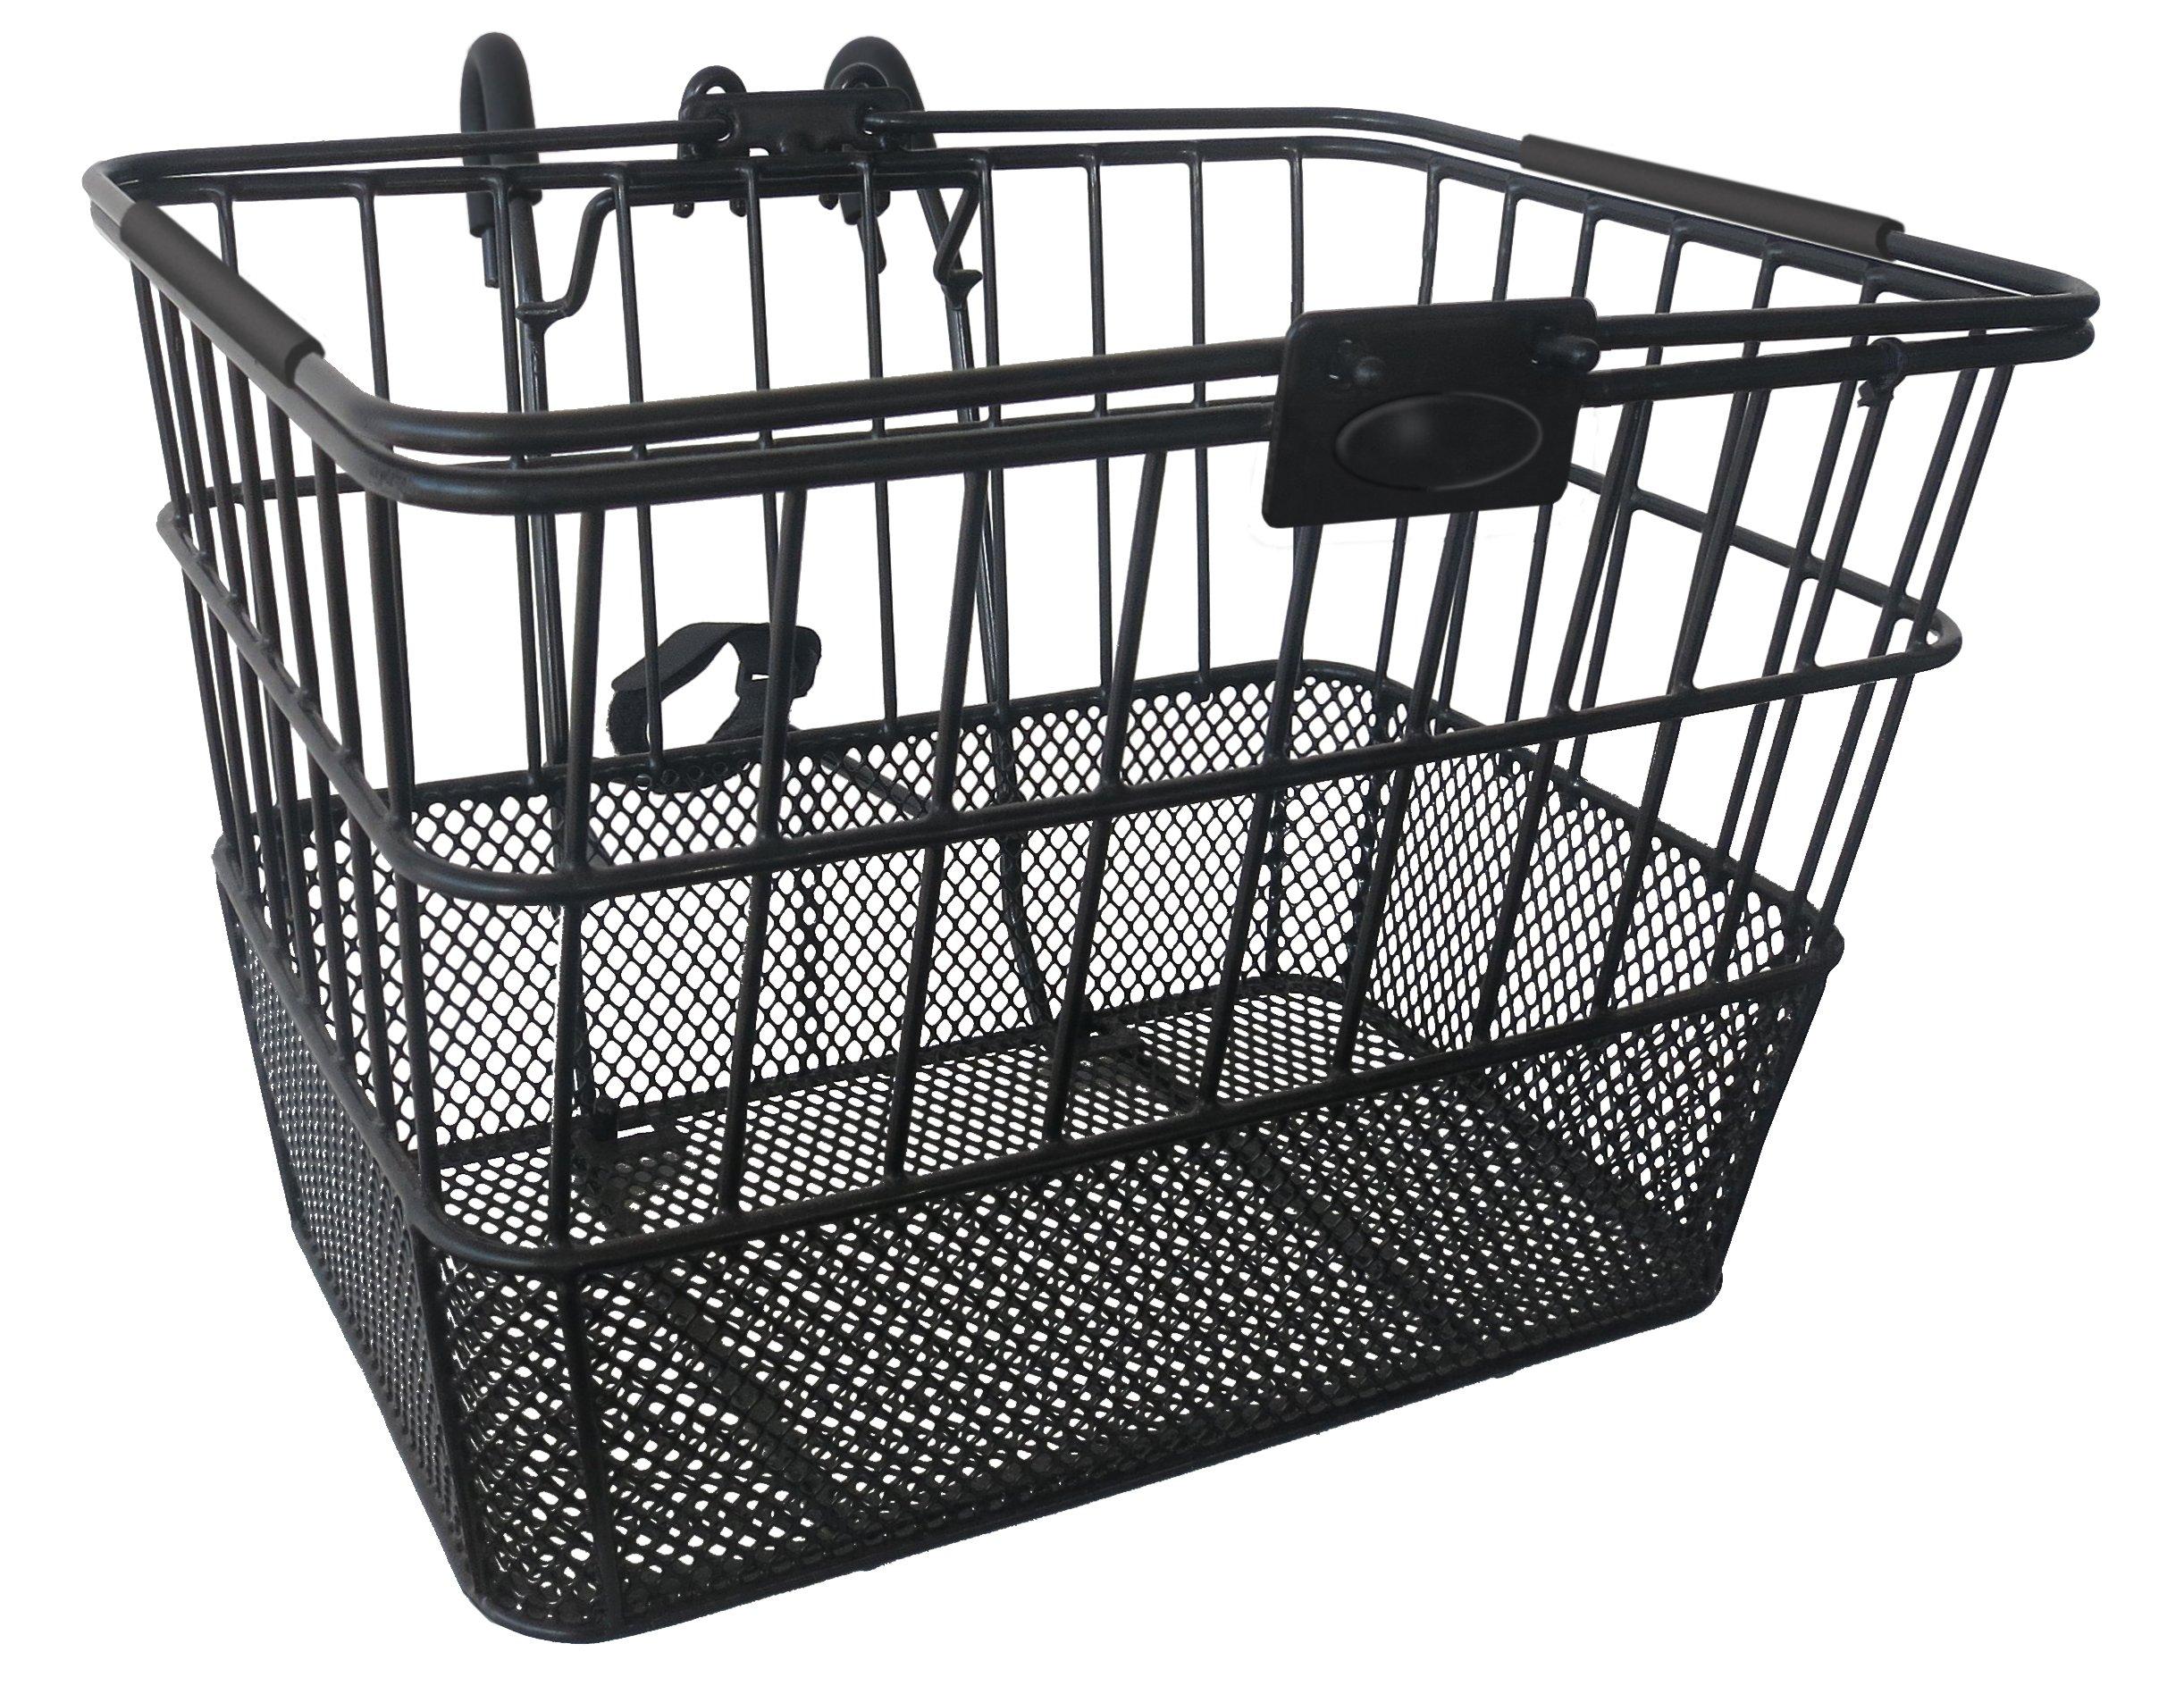 Treasure Gifts Mesh Bottom Lift-Off Basket w/Bracket, Black